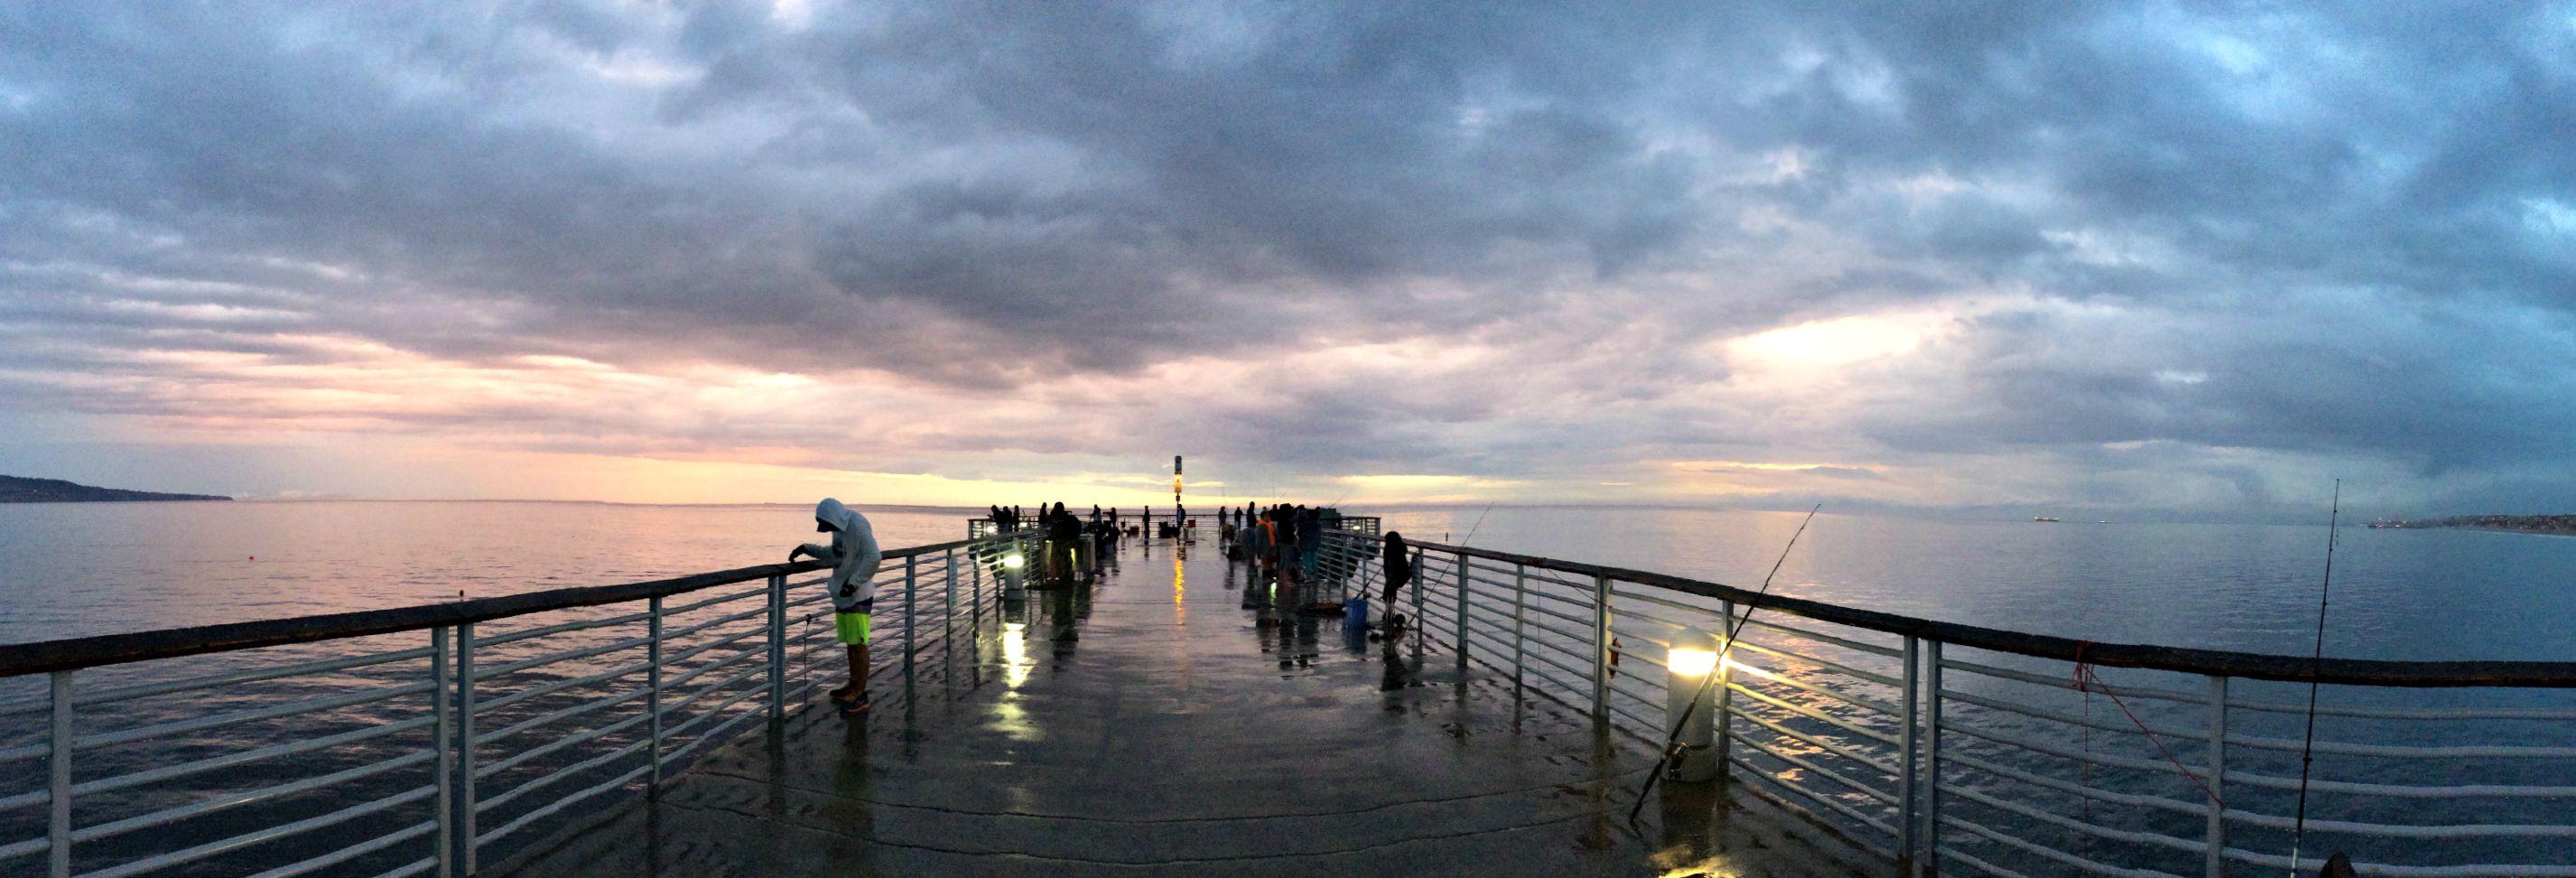 hermosa beach pier ocean view